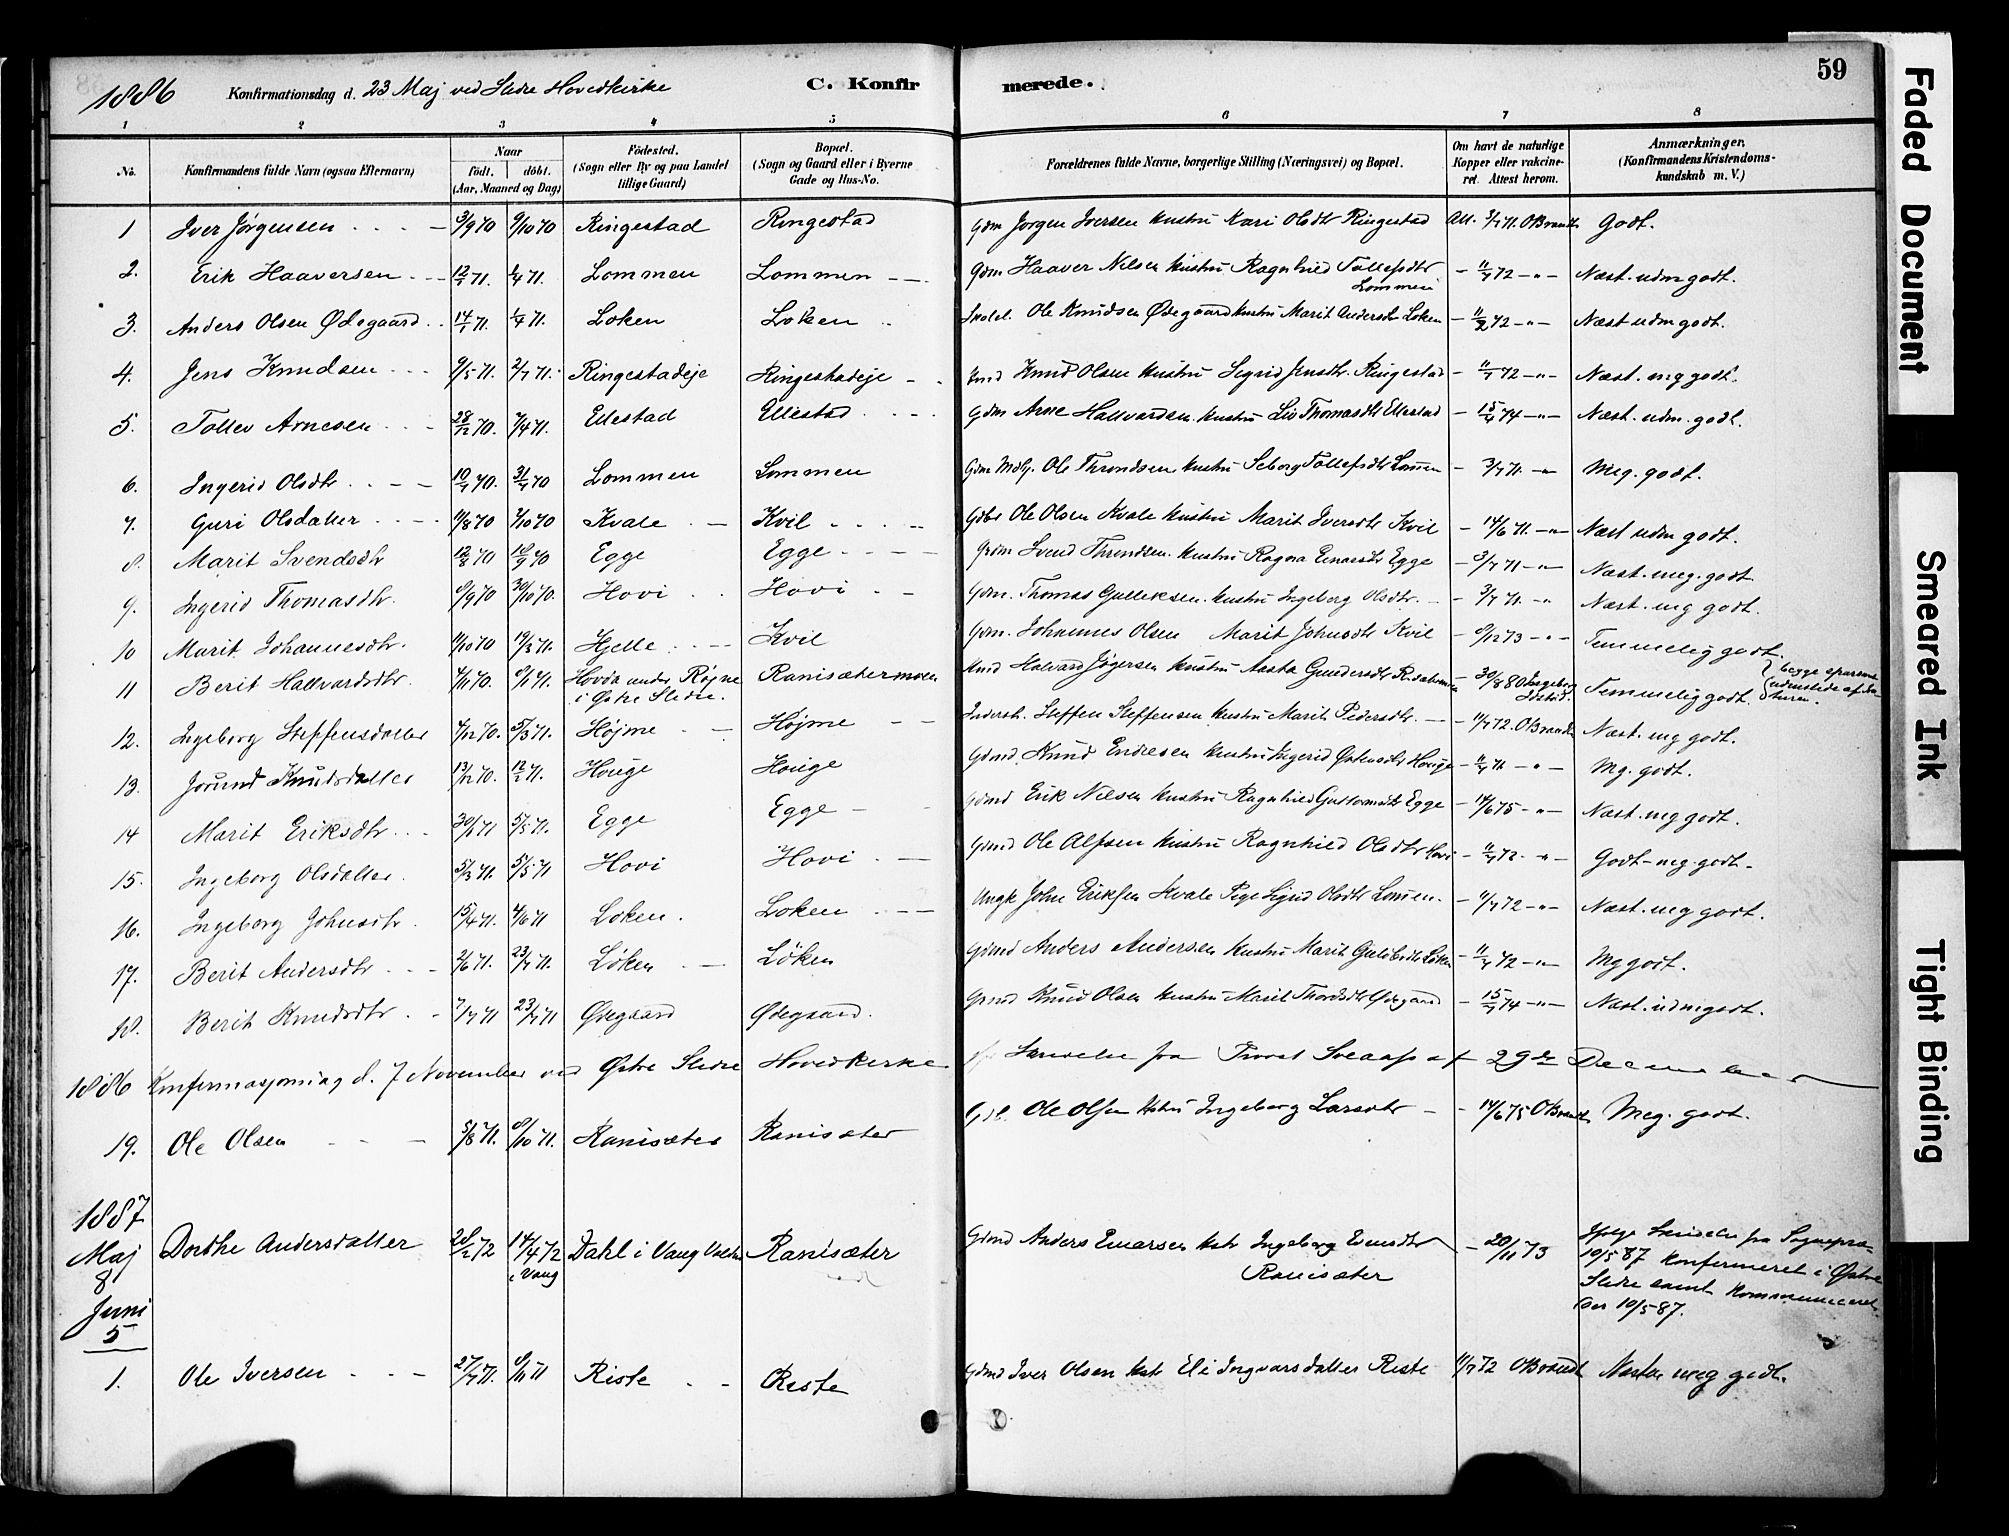 SAH, Vestre Slidre prestekontor, Ministerialbok nr. 5, 1881-1912, s. 59